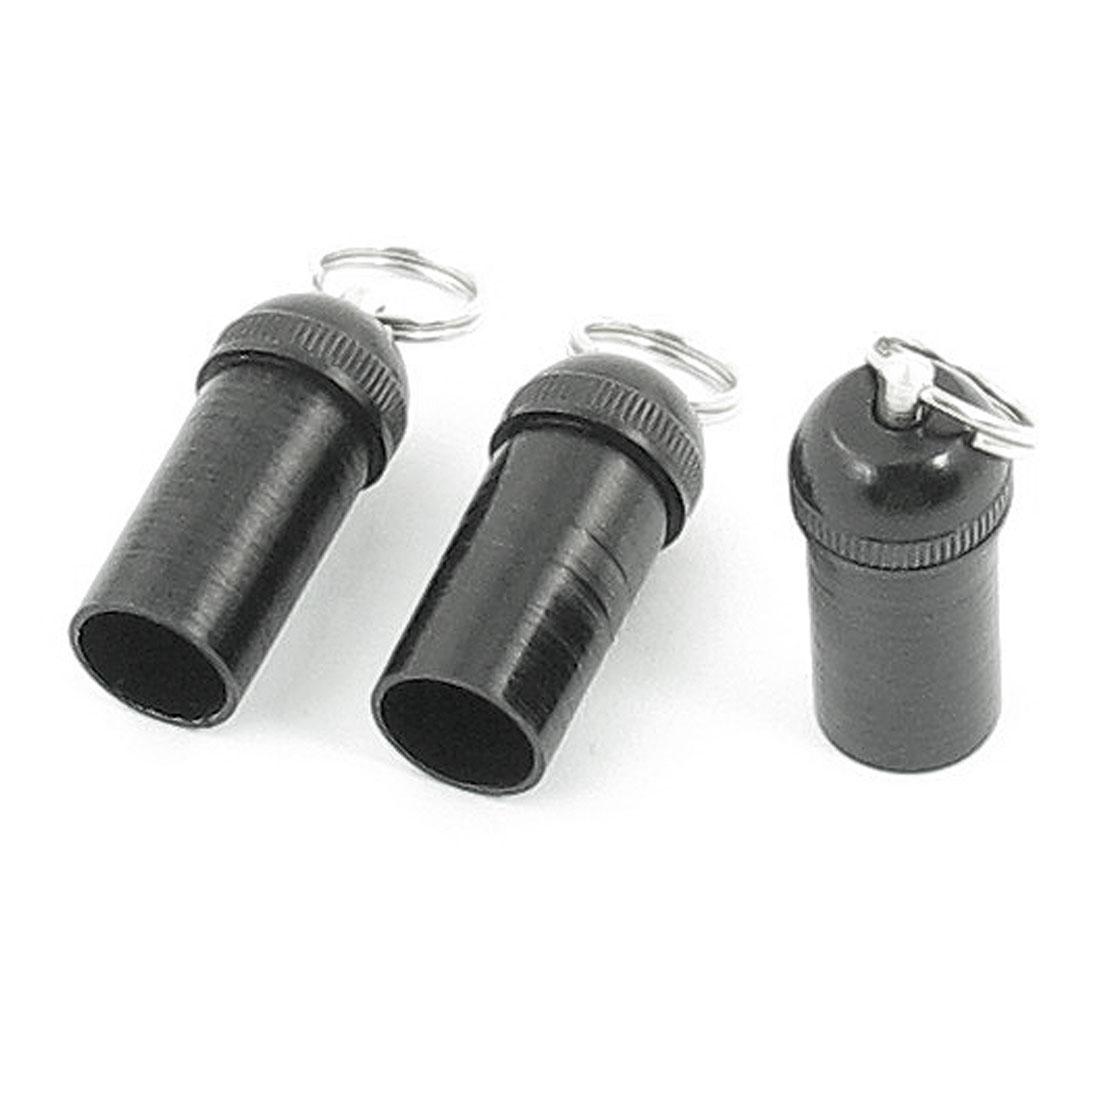 Plastic 10mm Diameter End Stopper Cap w Ring for Fishing Pole